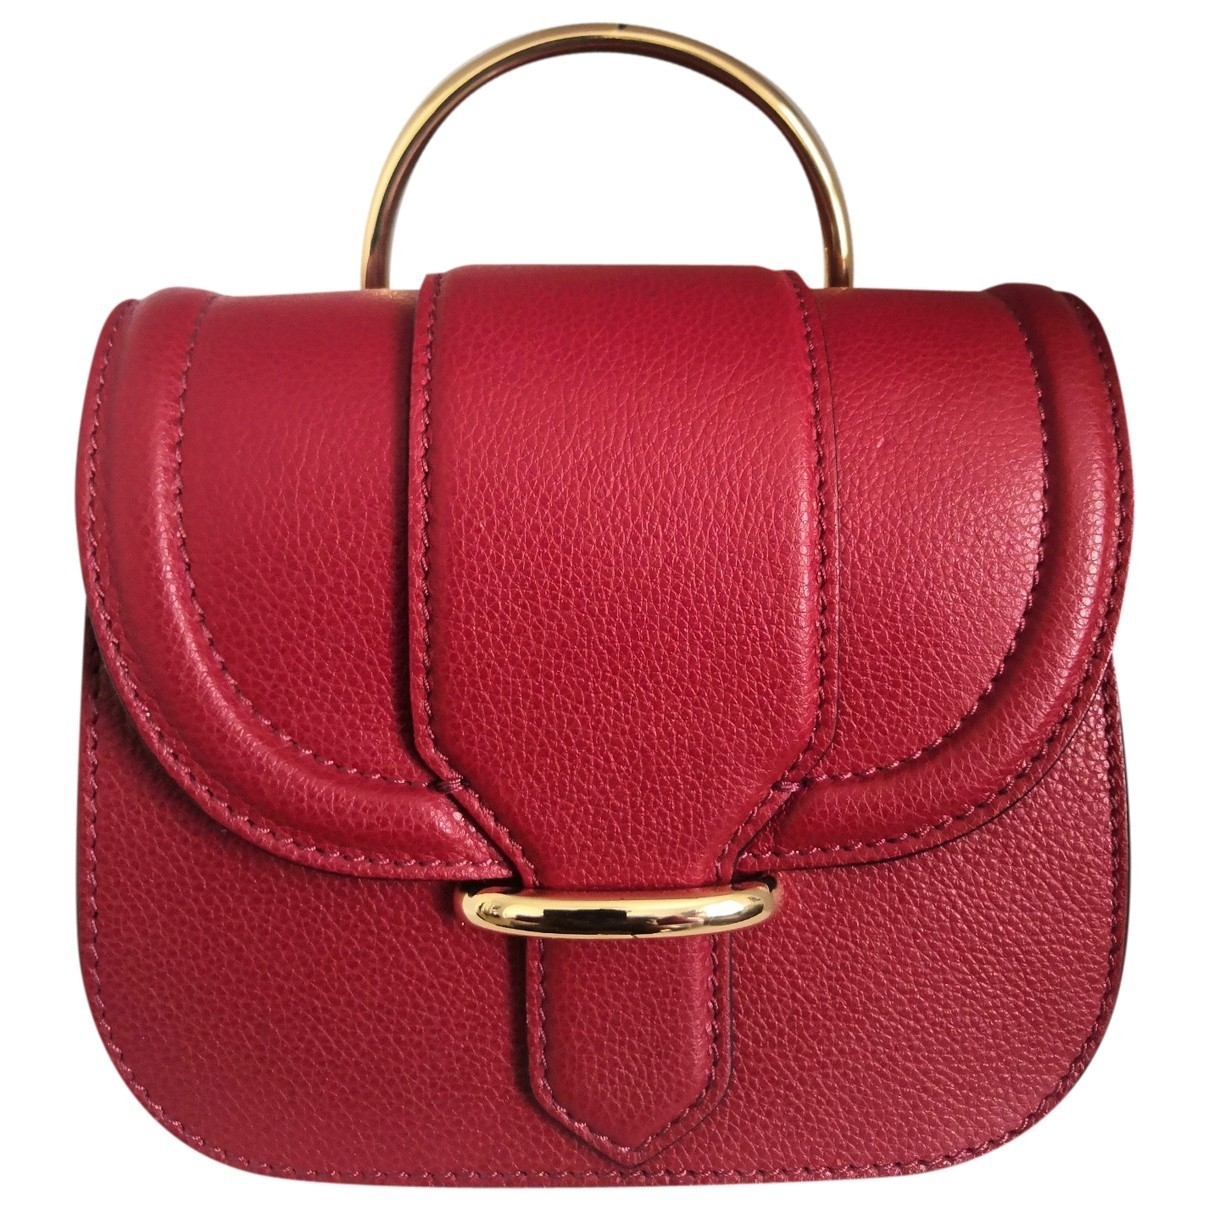 Gianni Chiarini \N Handtasche in  Rot Leder